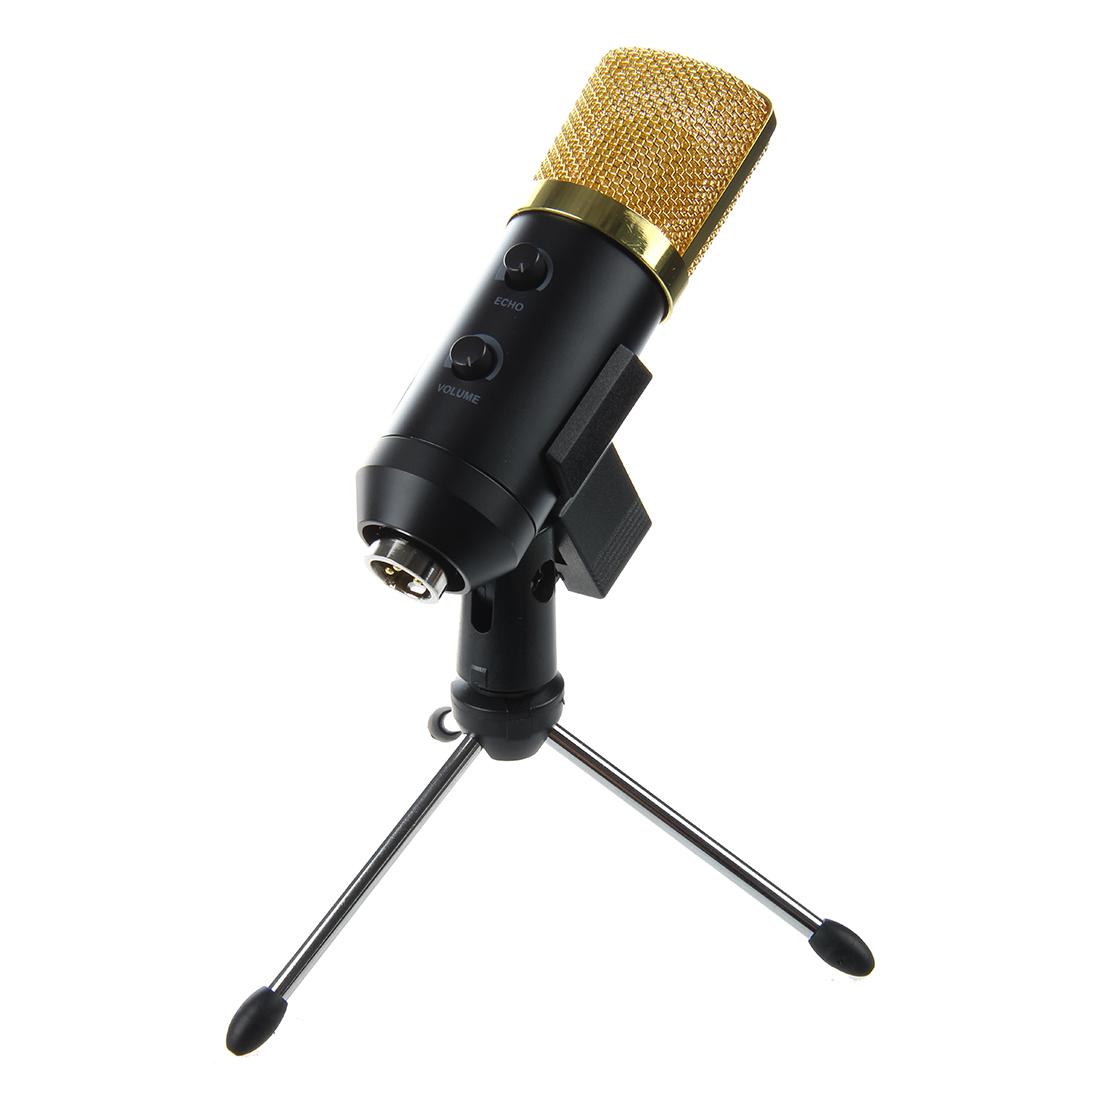 usb studio condenser recording microphone with sponge audio cable tripod e8z8 ebay. Black Bedroom Furniture Sets. Home Design Ideas